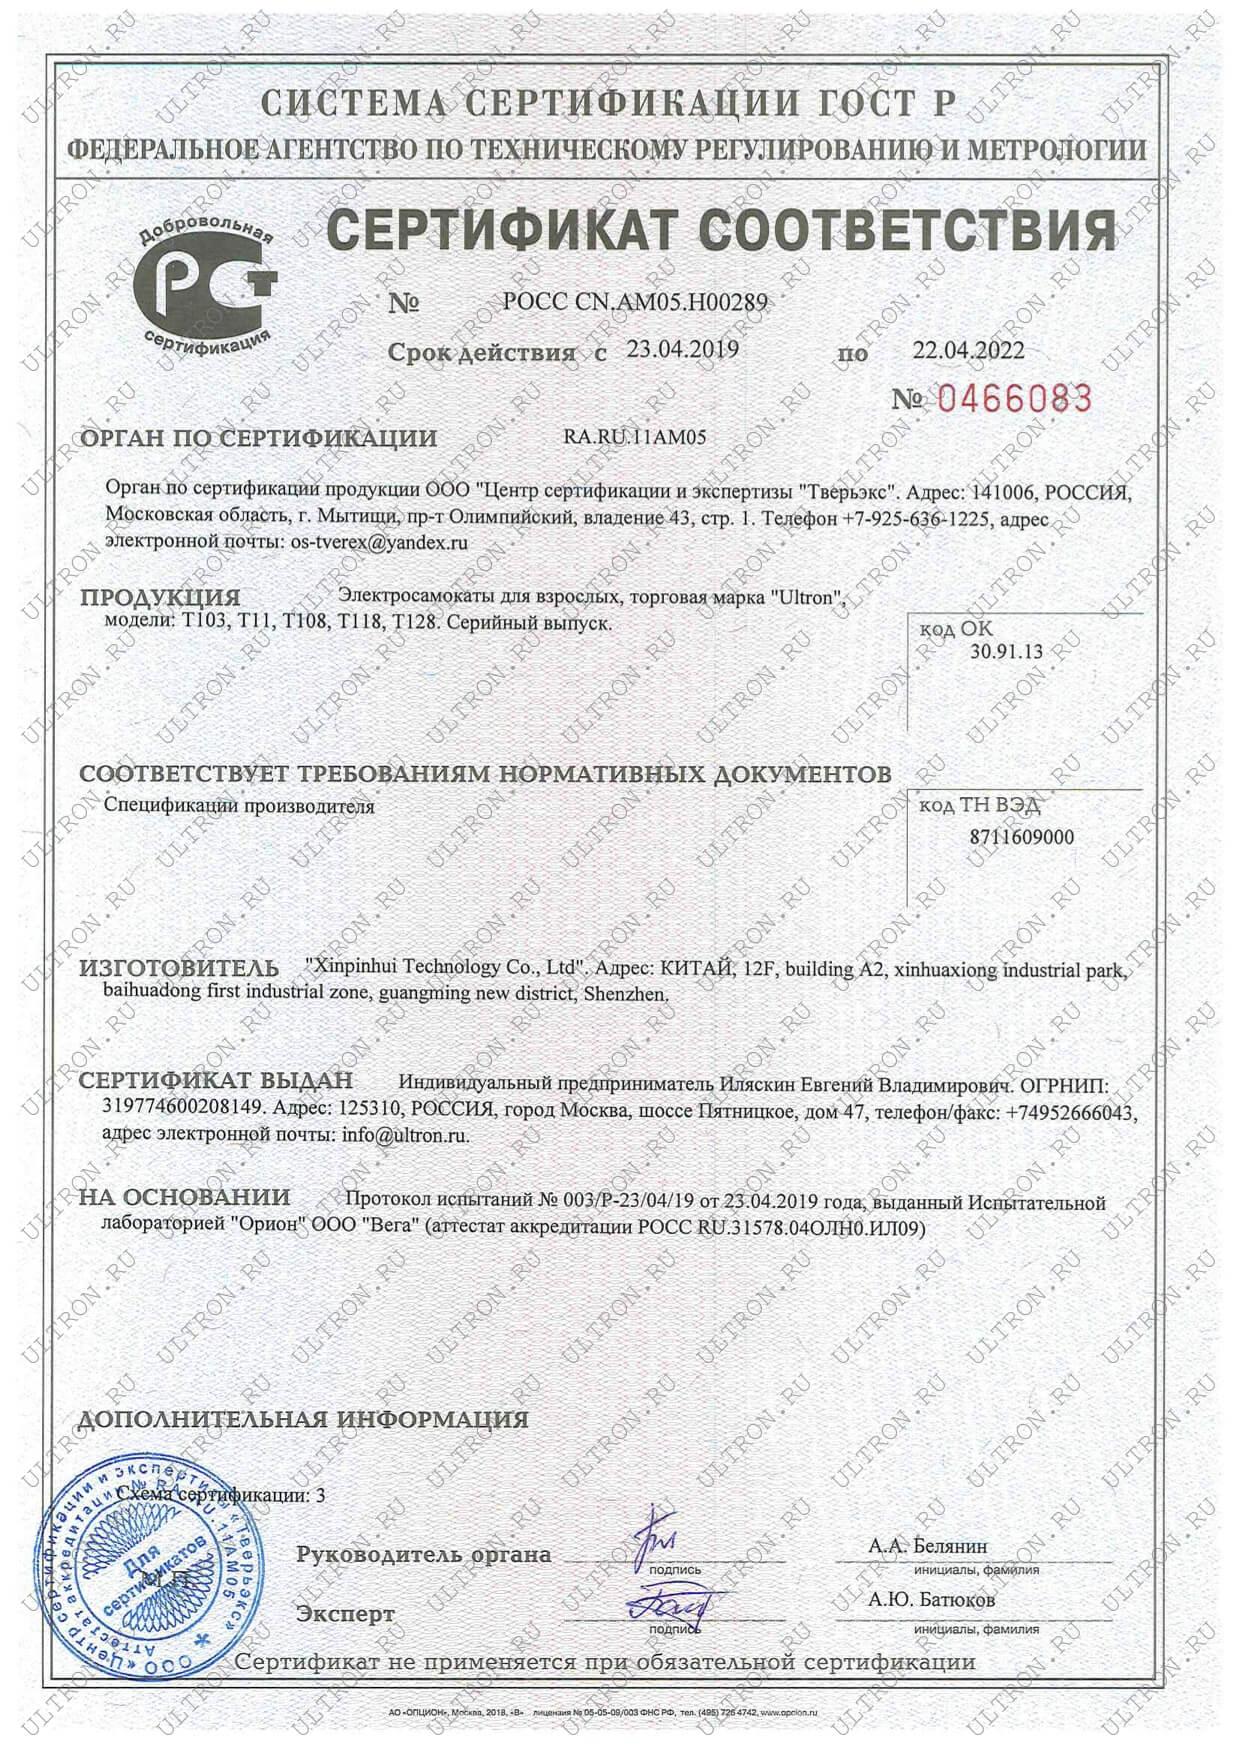 ULTRON.RU_Сертификат соответствия